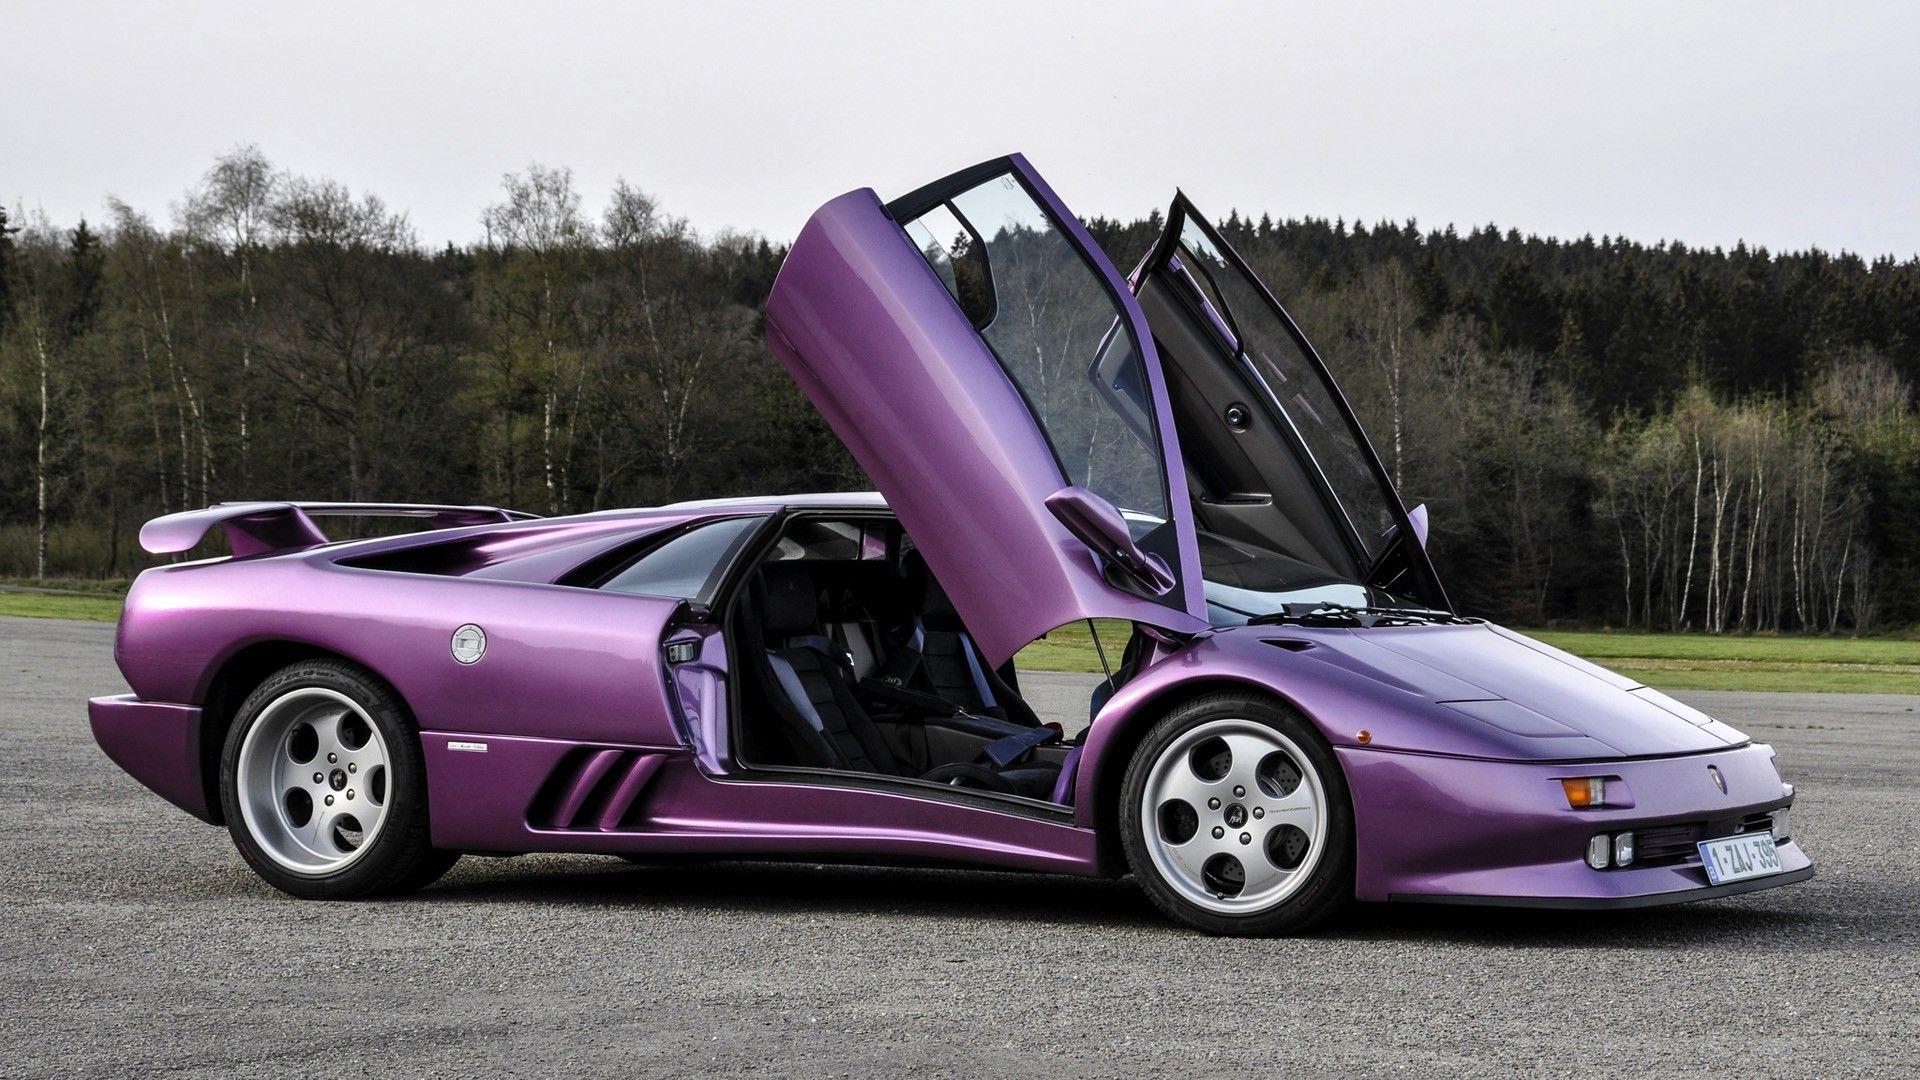 Lamborghini Diablo Purple